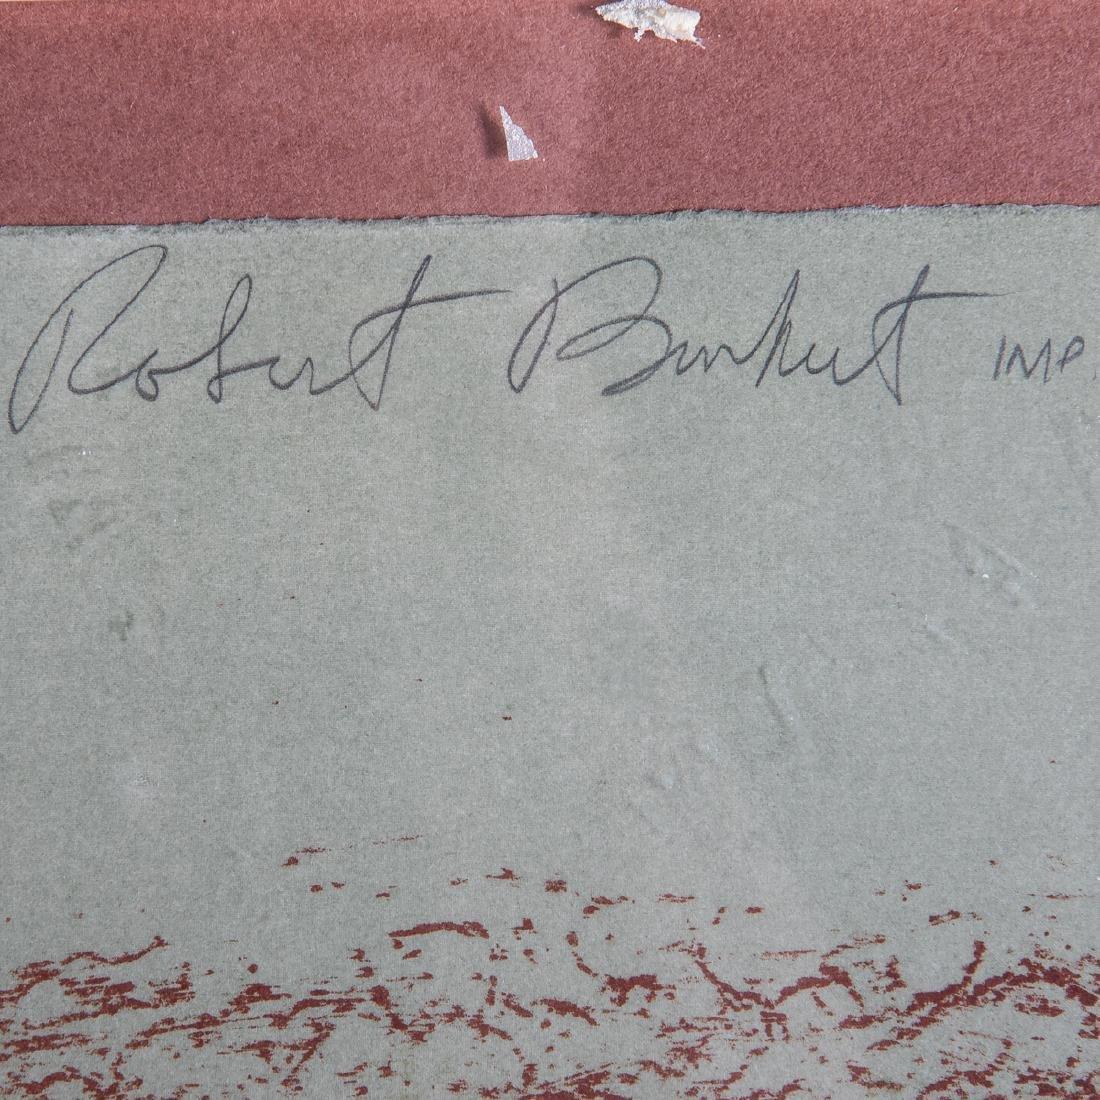 Robert Randall Burkert (b. 1930) 'Sea Edge' and 'Shore - 7